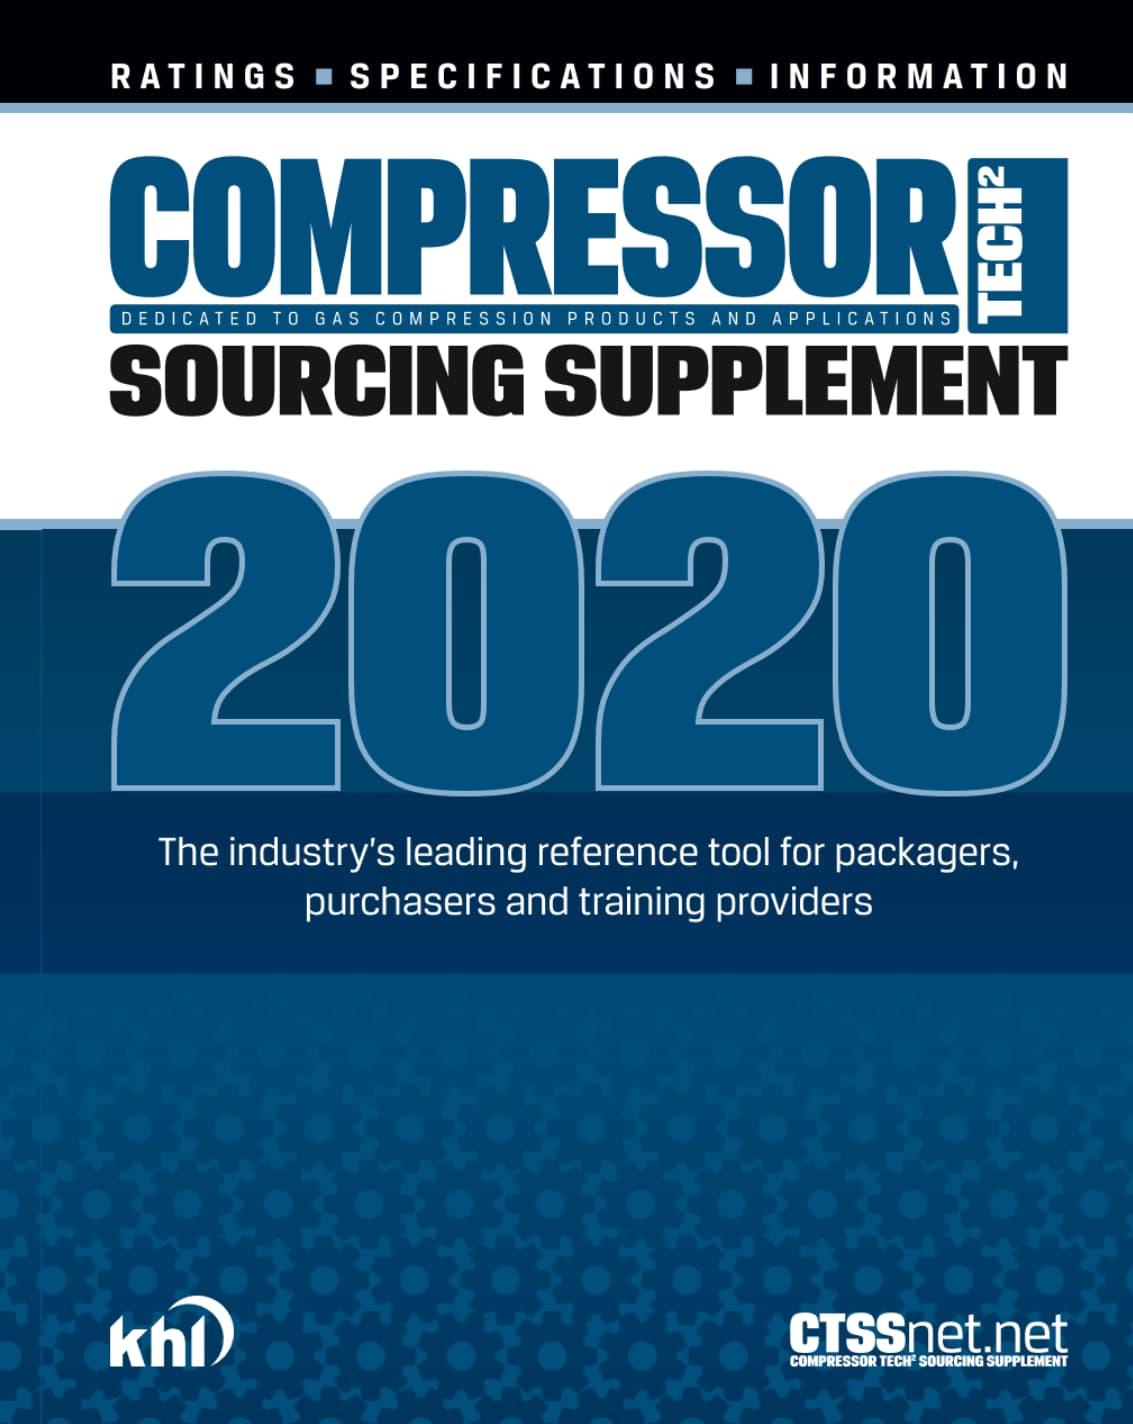 Compressor Sourcing Supplement 2020 Cover